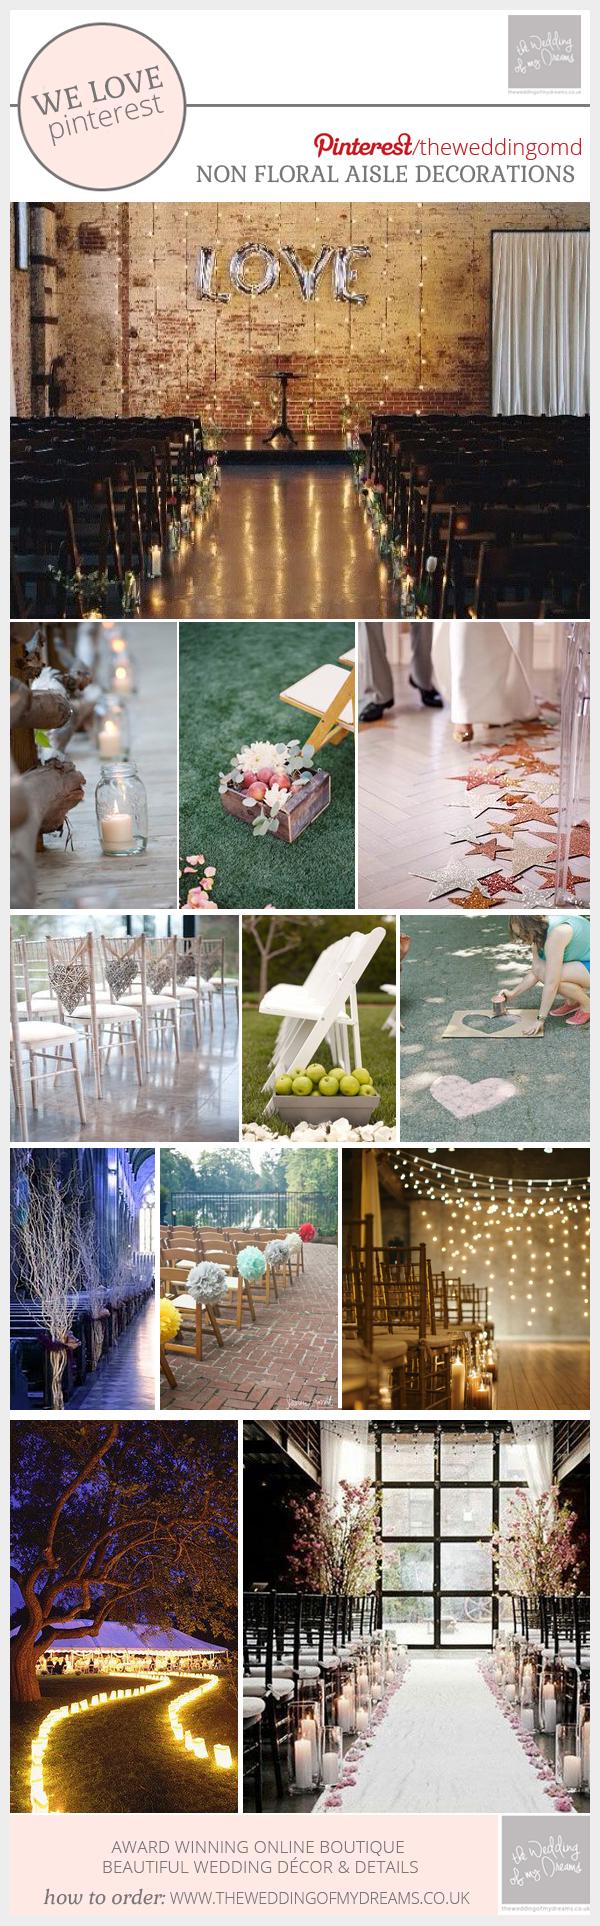 Non floral aisle decorations for wedding ceremonies